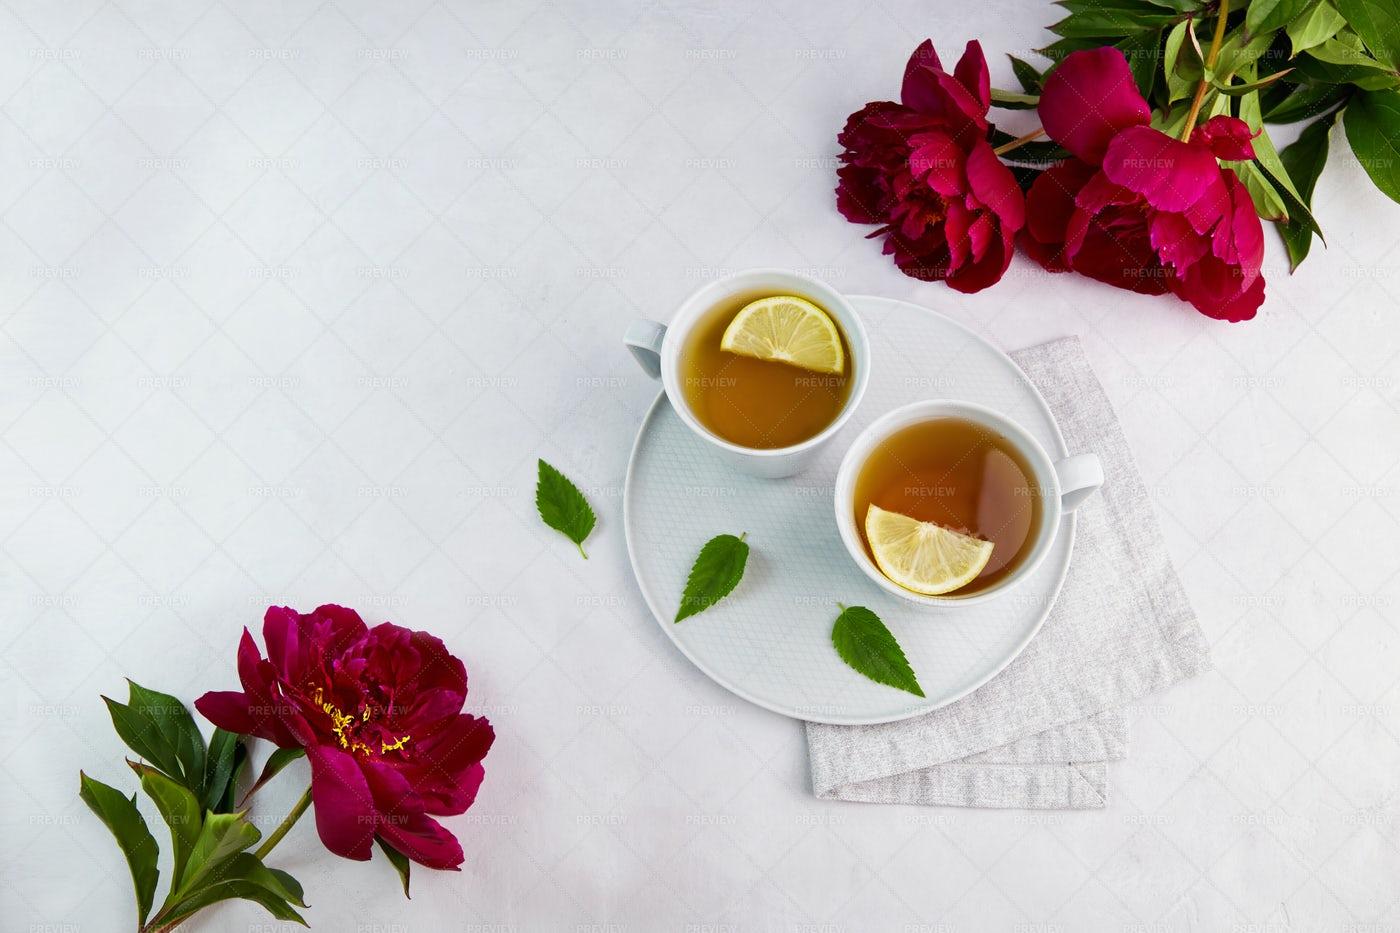 Cups Of Tea And Peonies: Stock Photos